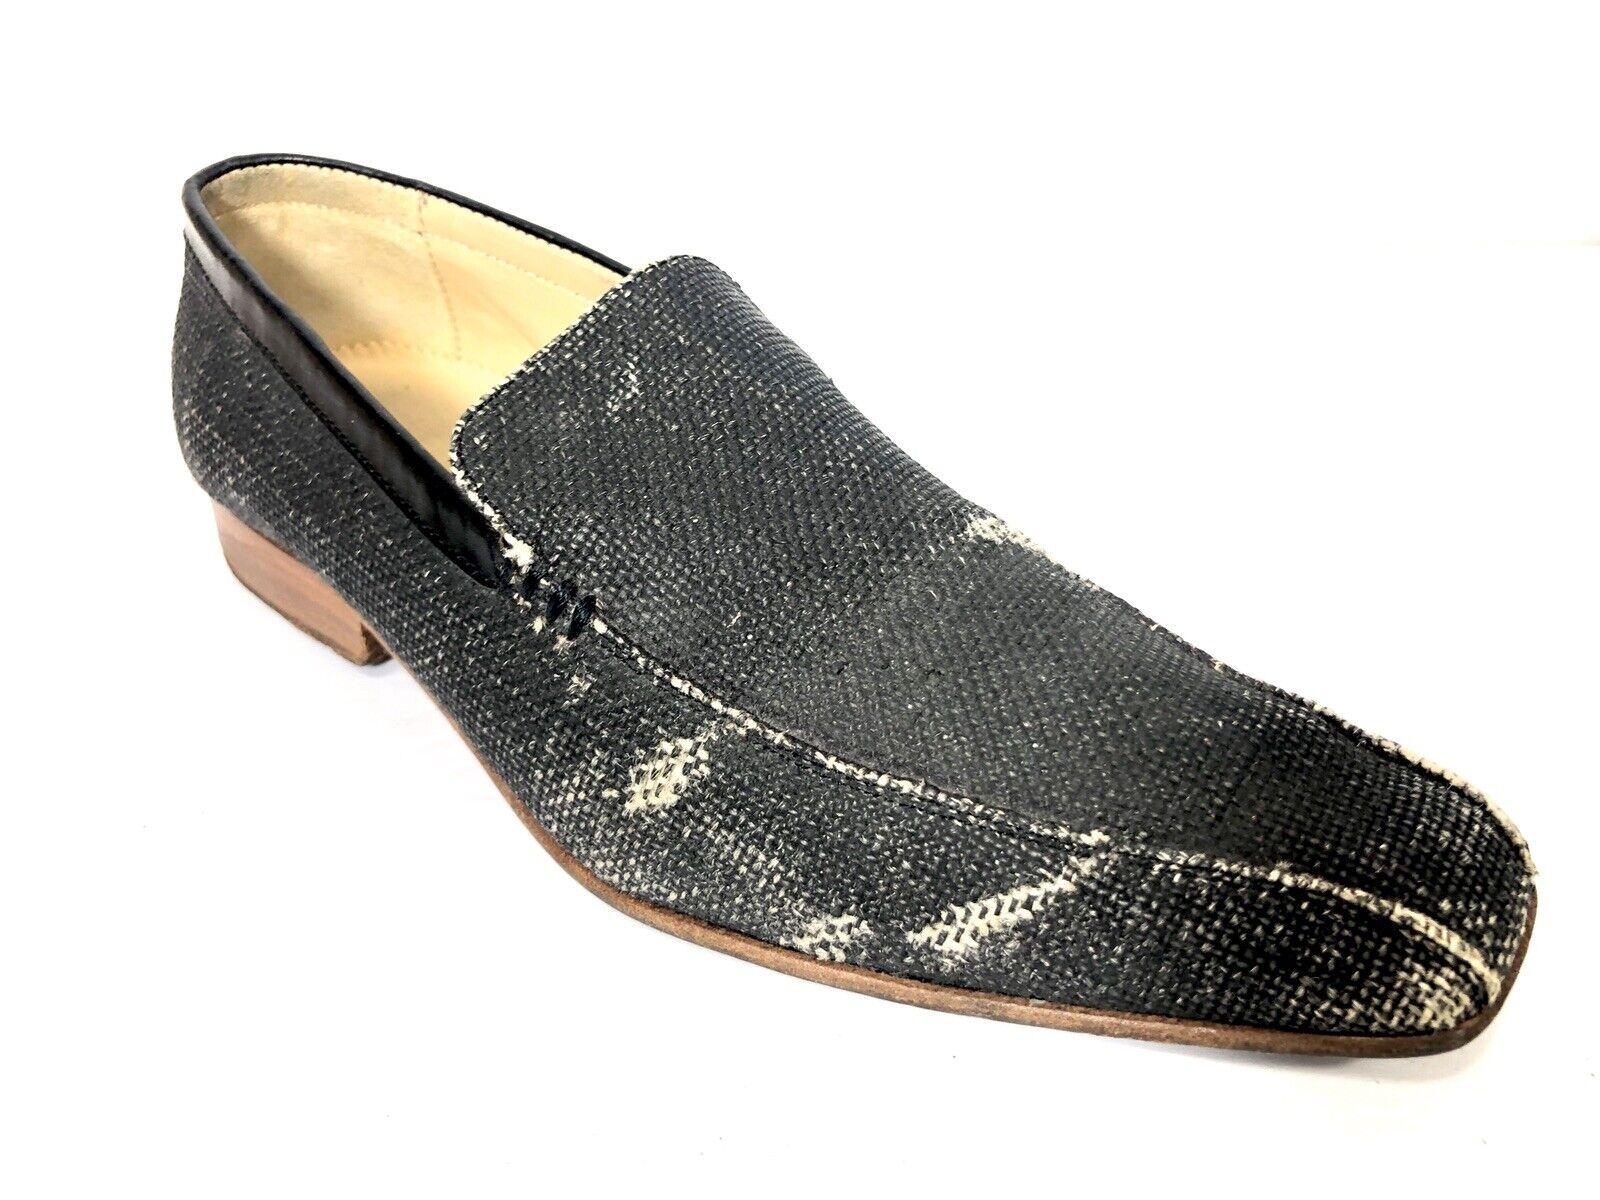 Kenzo Mens 7 Loafers Slip On Canvas Distressed Black Wooden Heel